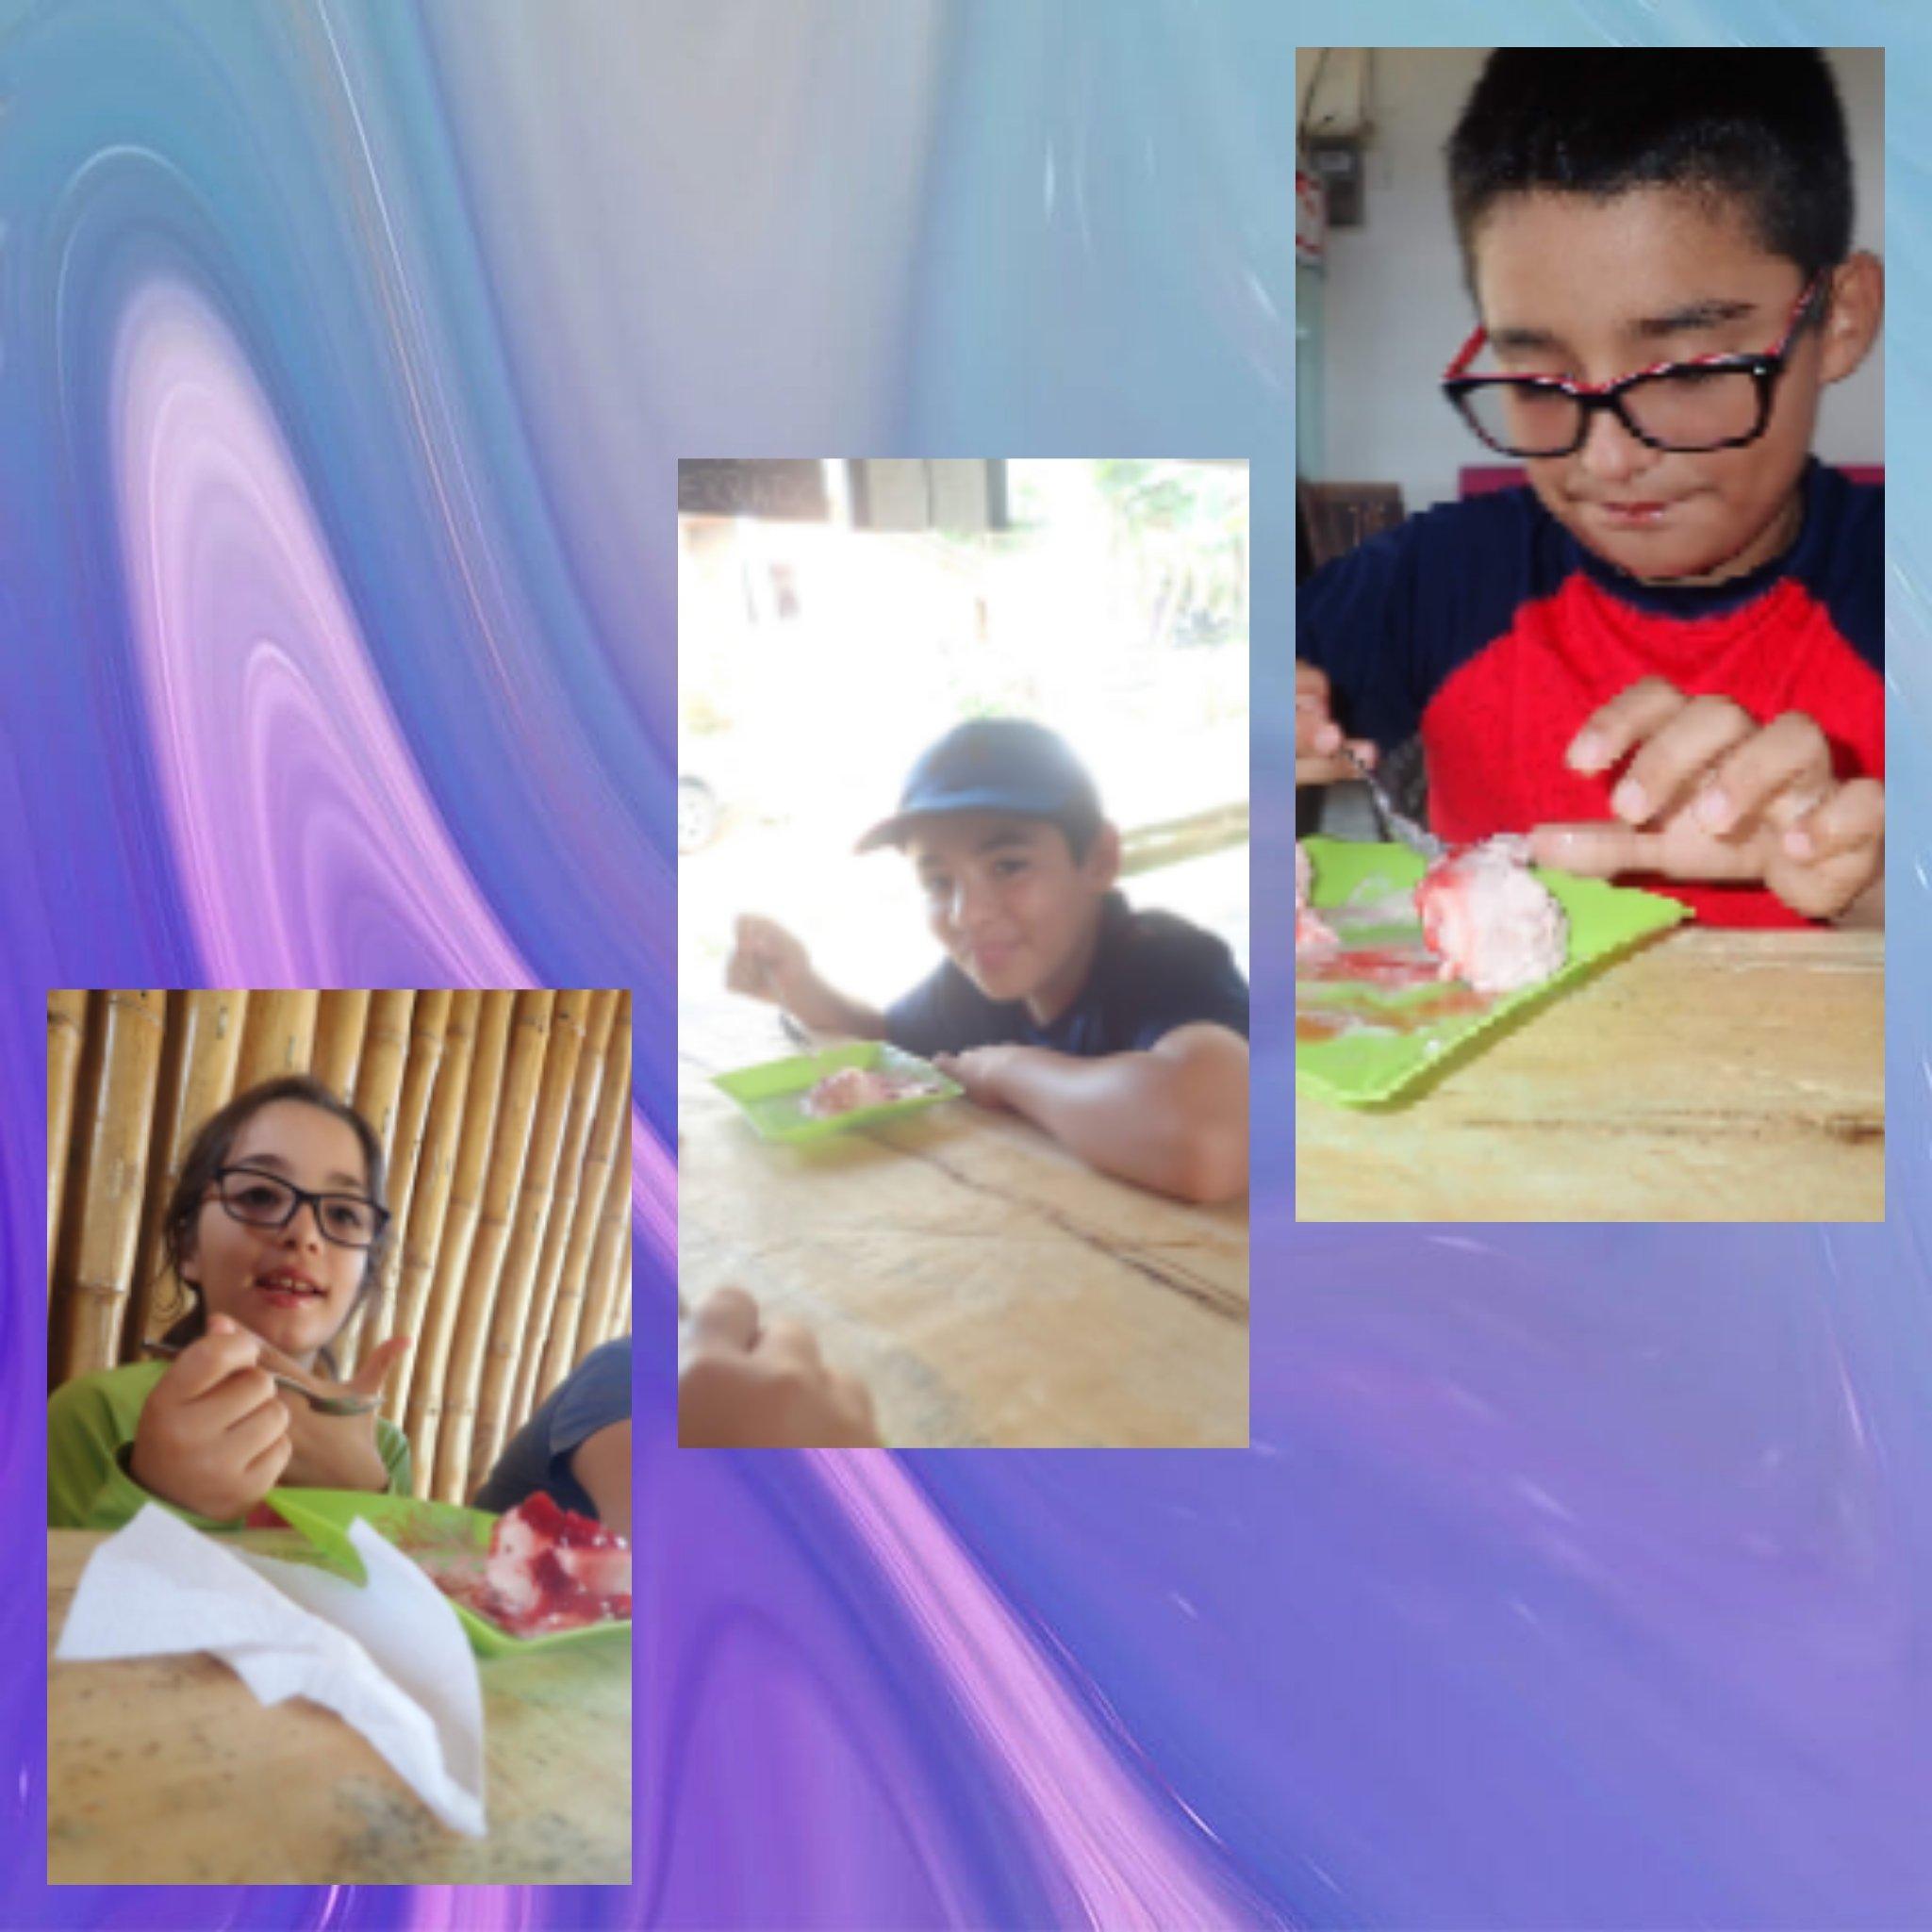 Marco, Mateo and Daniela eating ice cream at La Tarteria Minca Colombia